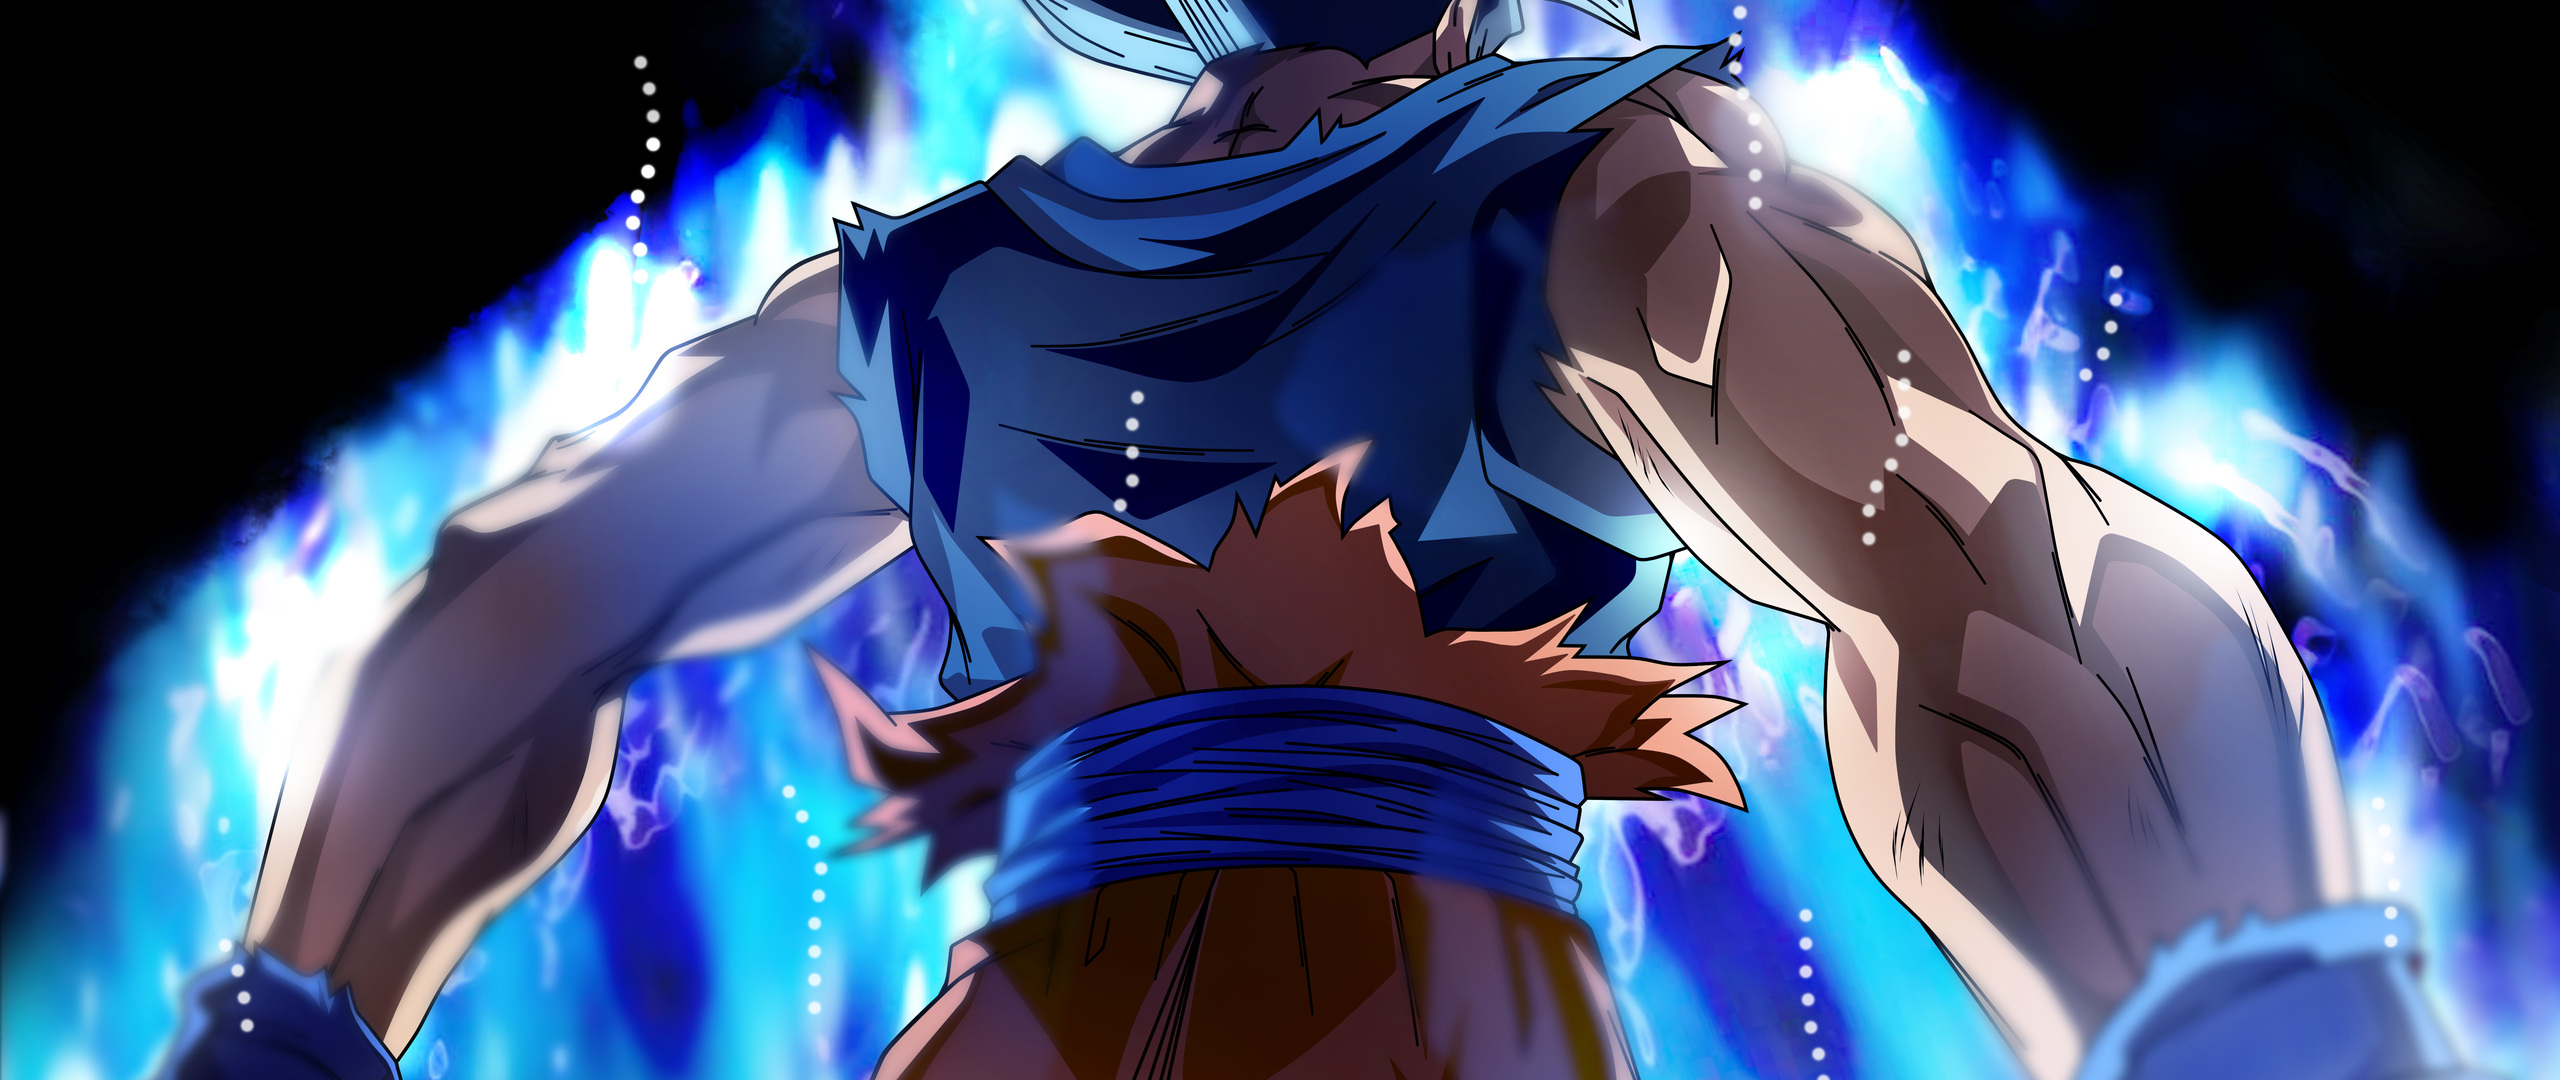 2560x1080 goku dragon ball super 5k anime 2560x1080 resolution hd 4k wallpapers images - Dragon ball super wallpaper 1080x1920 ...